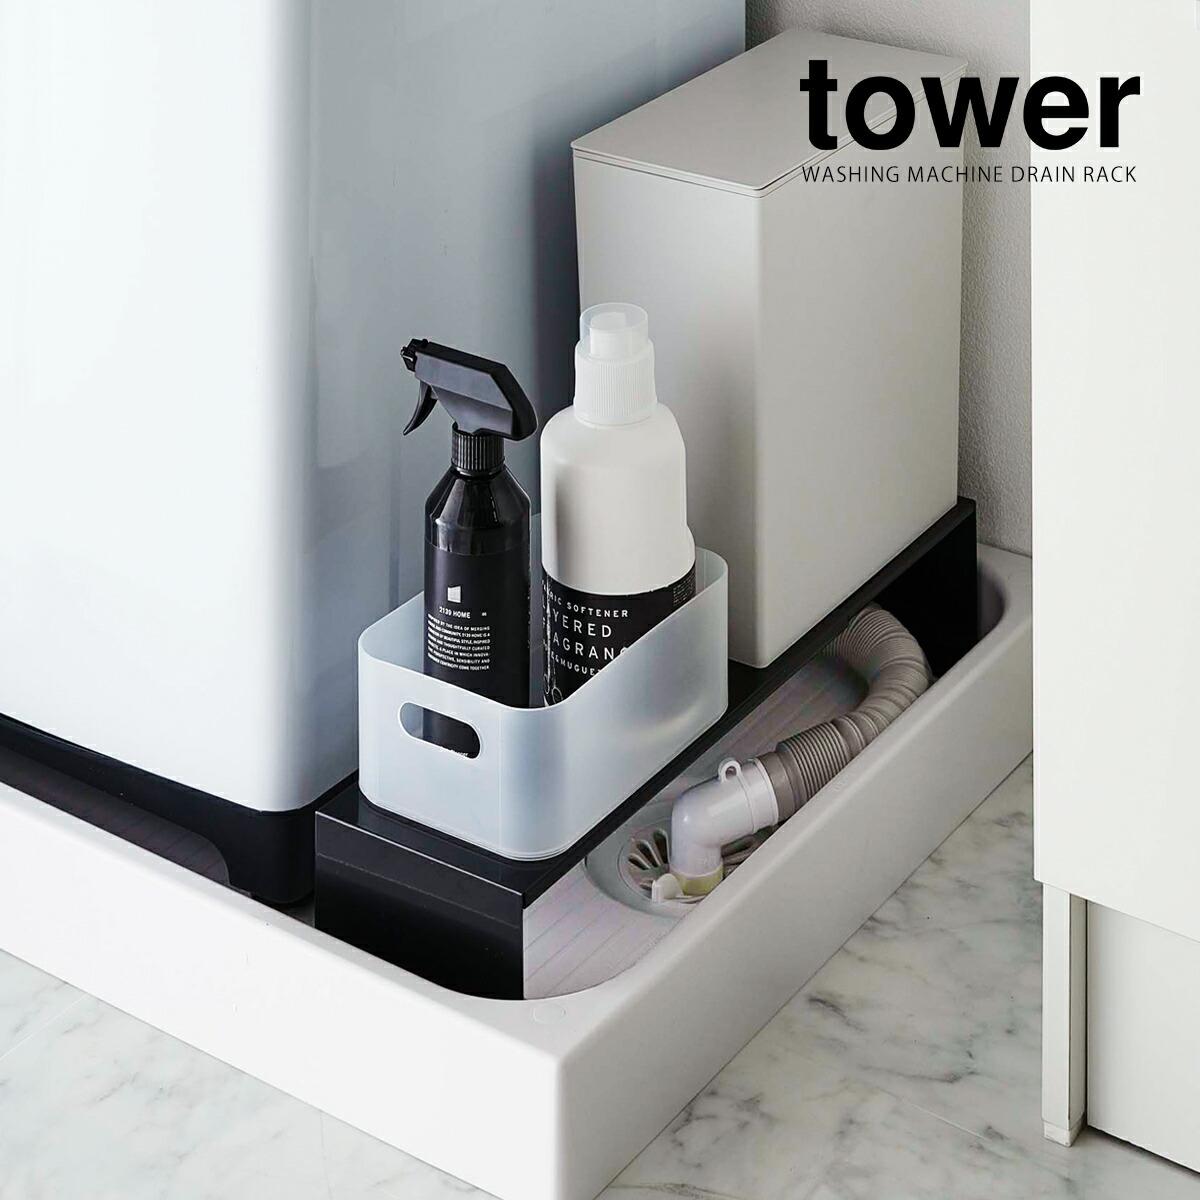 tower / タワー 伸縮 洗濯機隙間ラック 防水パン ランドリー収納 隙間収納 デッドスペース